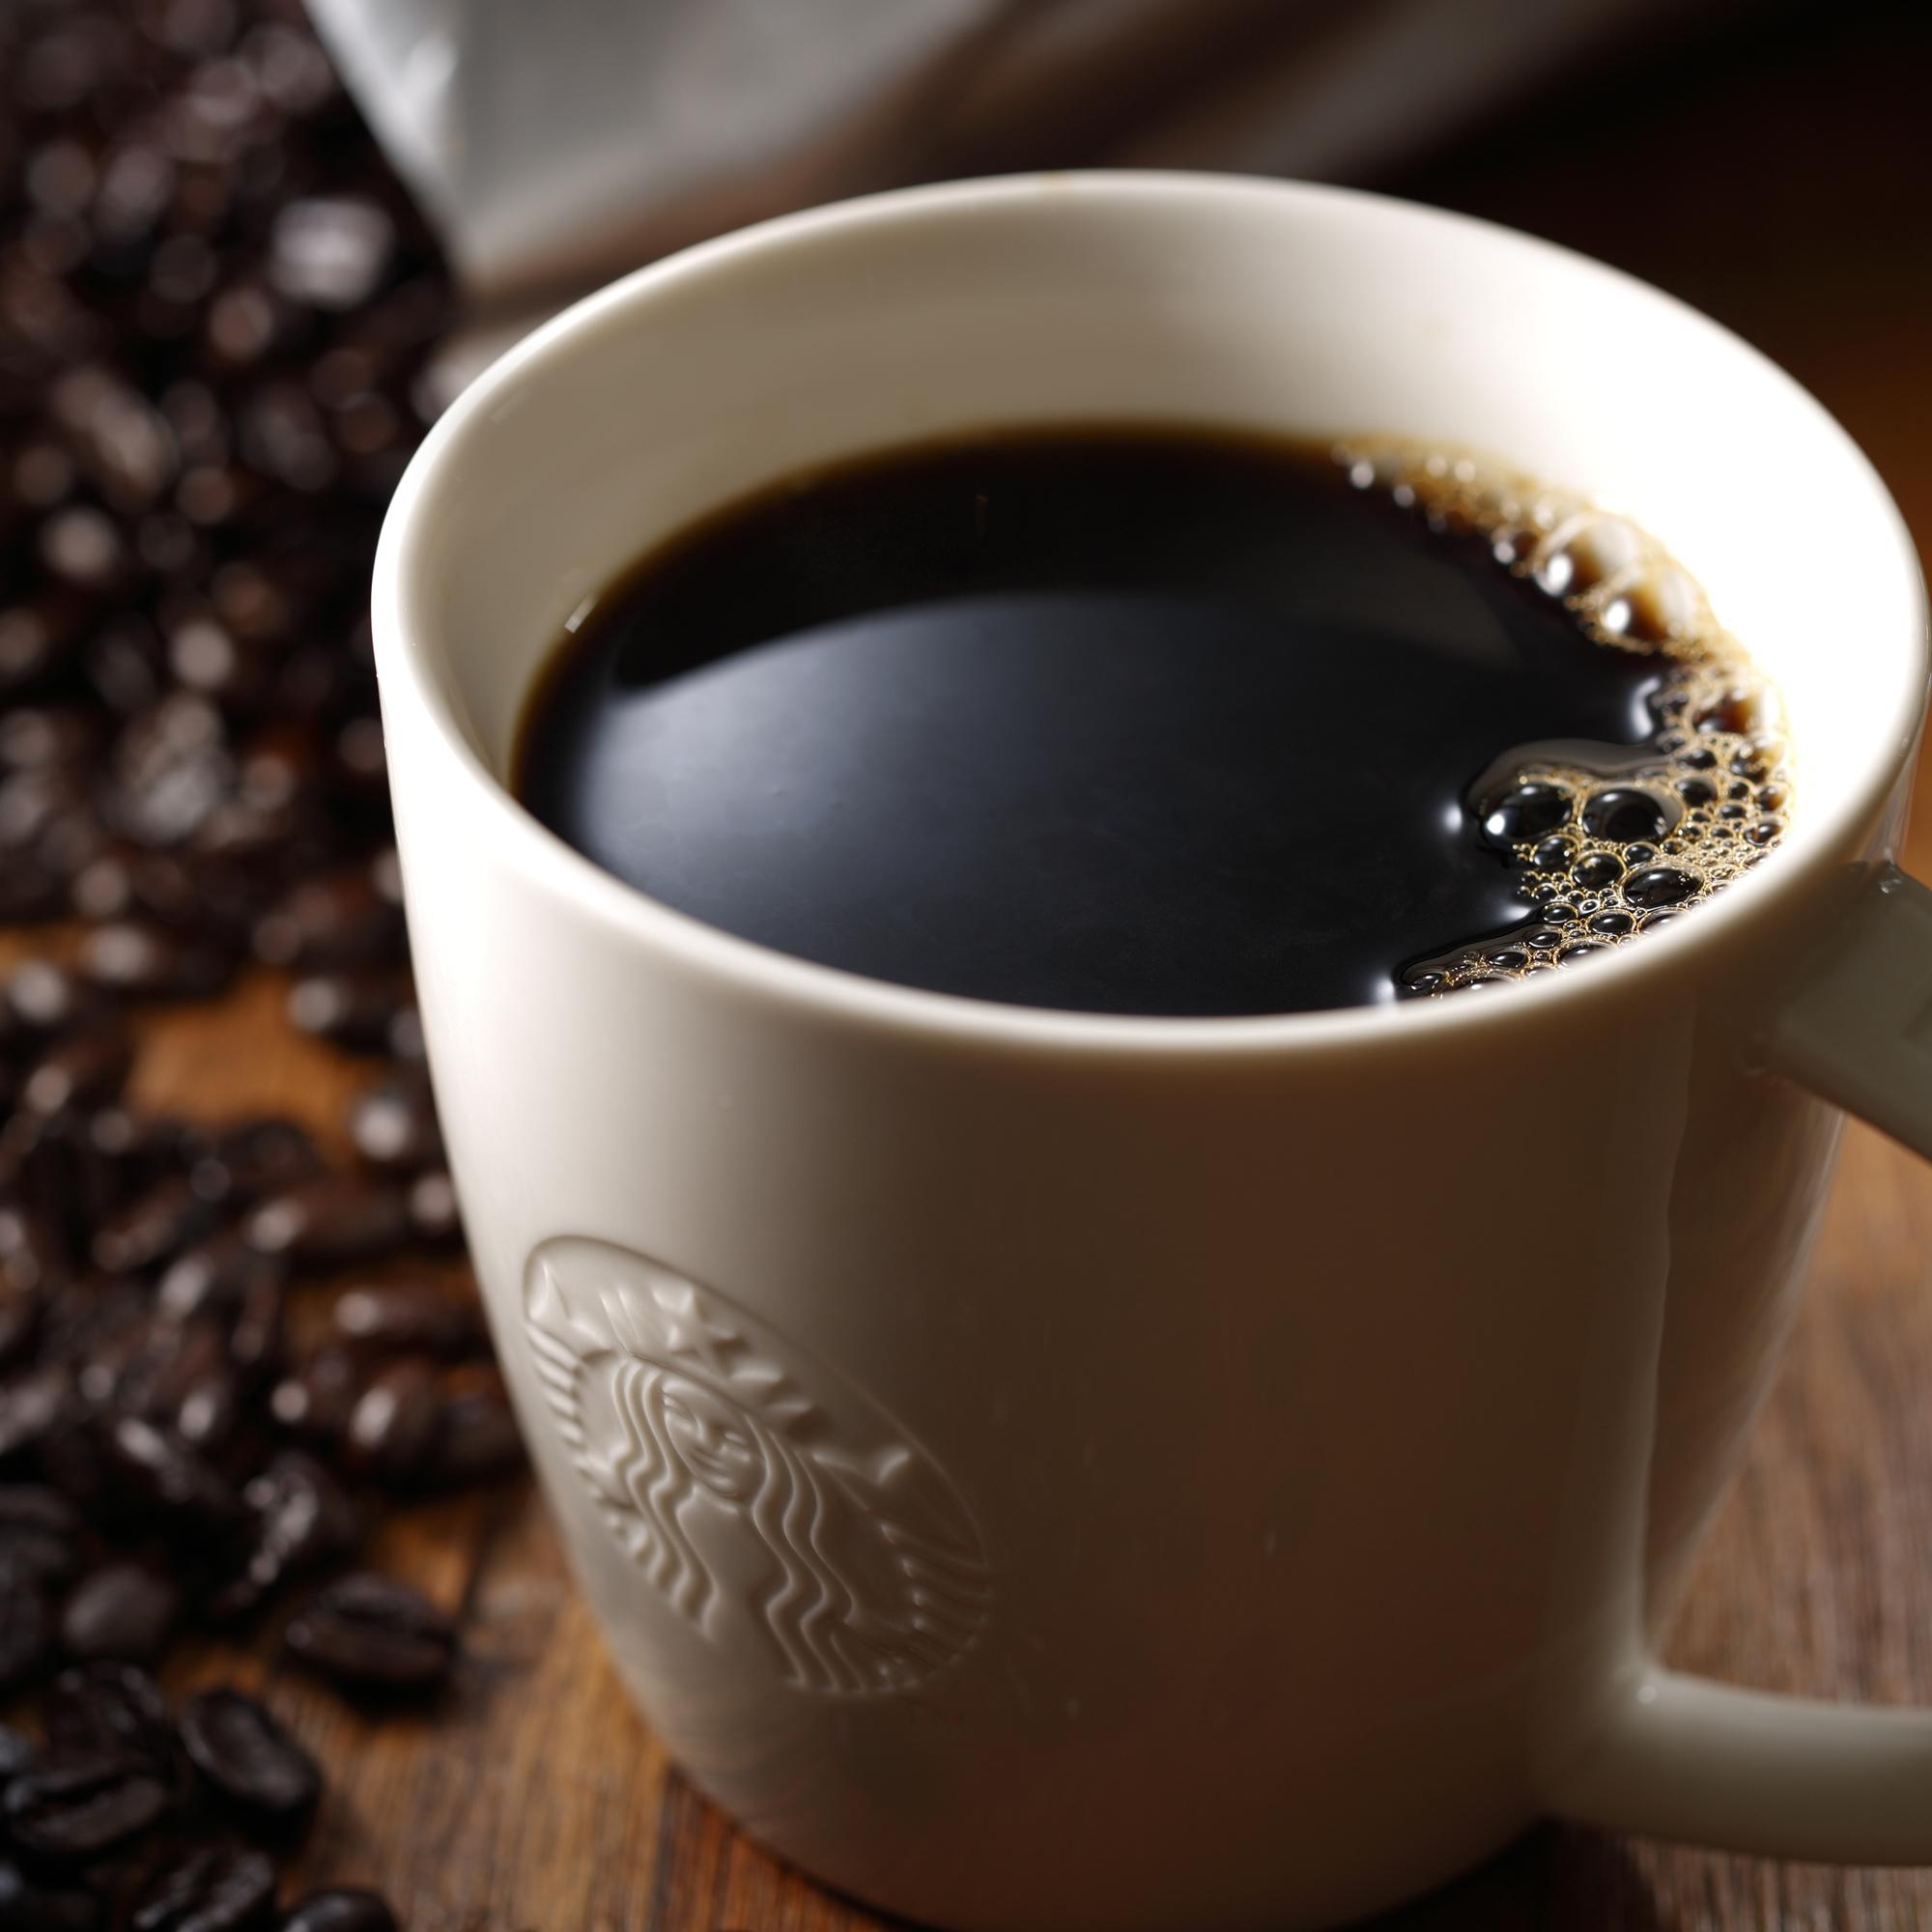 %e3%82%b9%e3%82%bf%e3%83%bc%e3%83%90%e3%83%83%e3%82%af%e3%82%b9_%e3%83%89%e3%83%aa%e3%83%83%e3%83%97-%e3%82%b3%e3%83%bc%e3%83%92%e3%83%bc_starbucks_drip_coffee-2